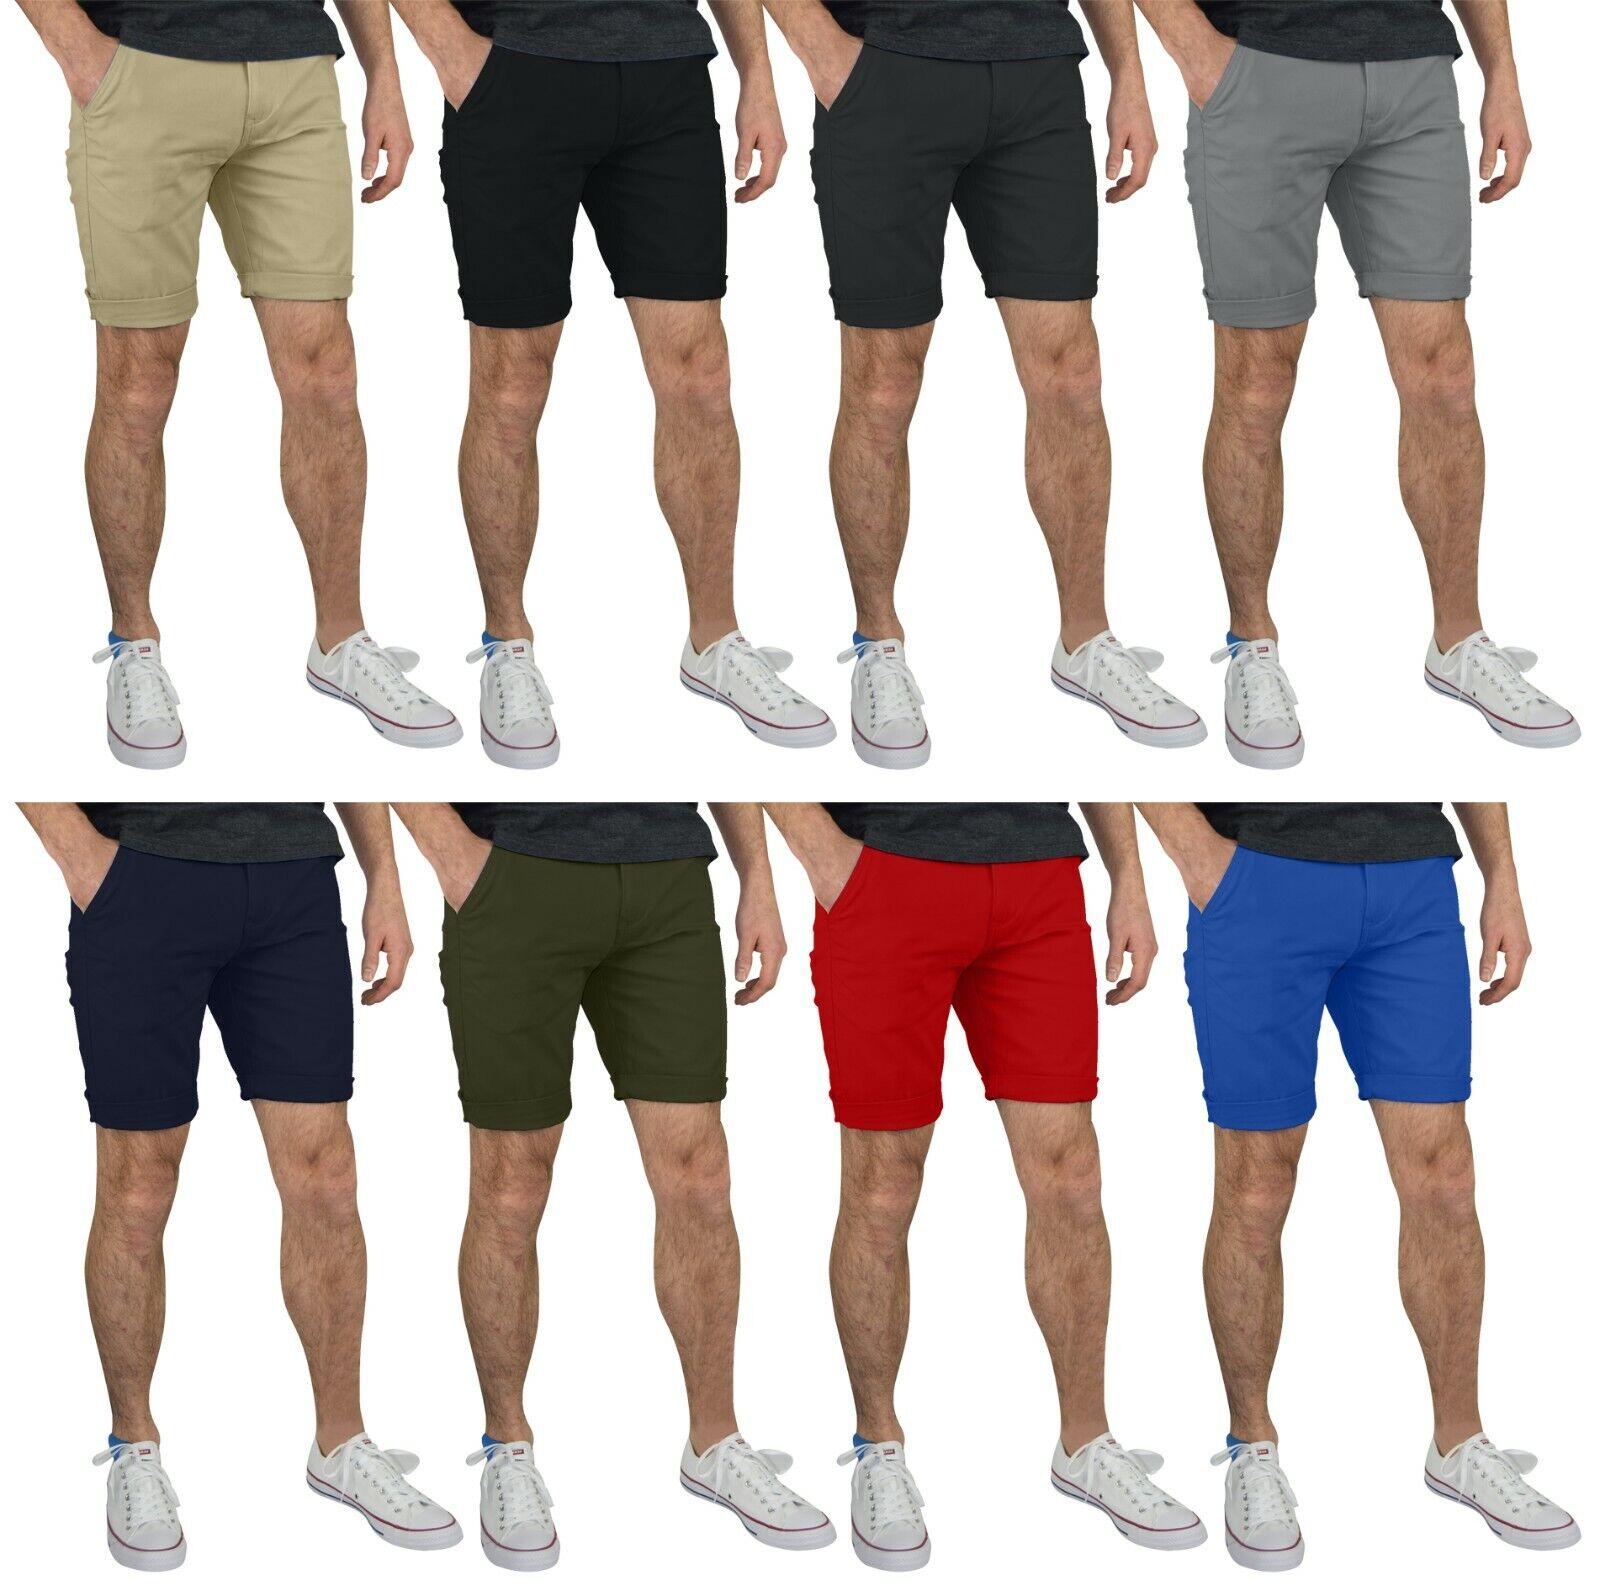 GantsHill Mens Flat Front Chino Shorts 100% Cotton Half Pant